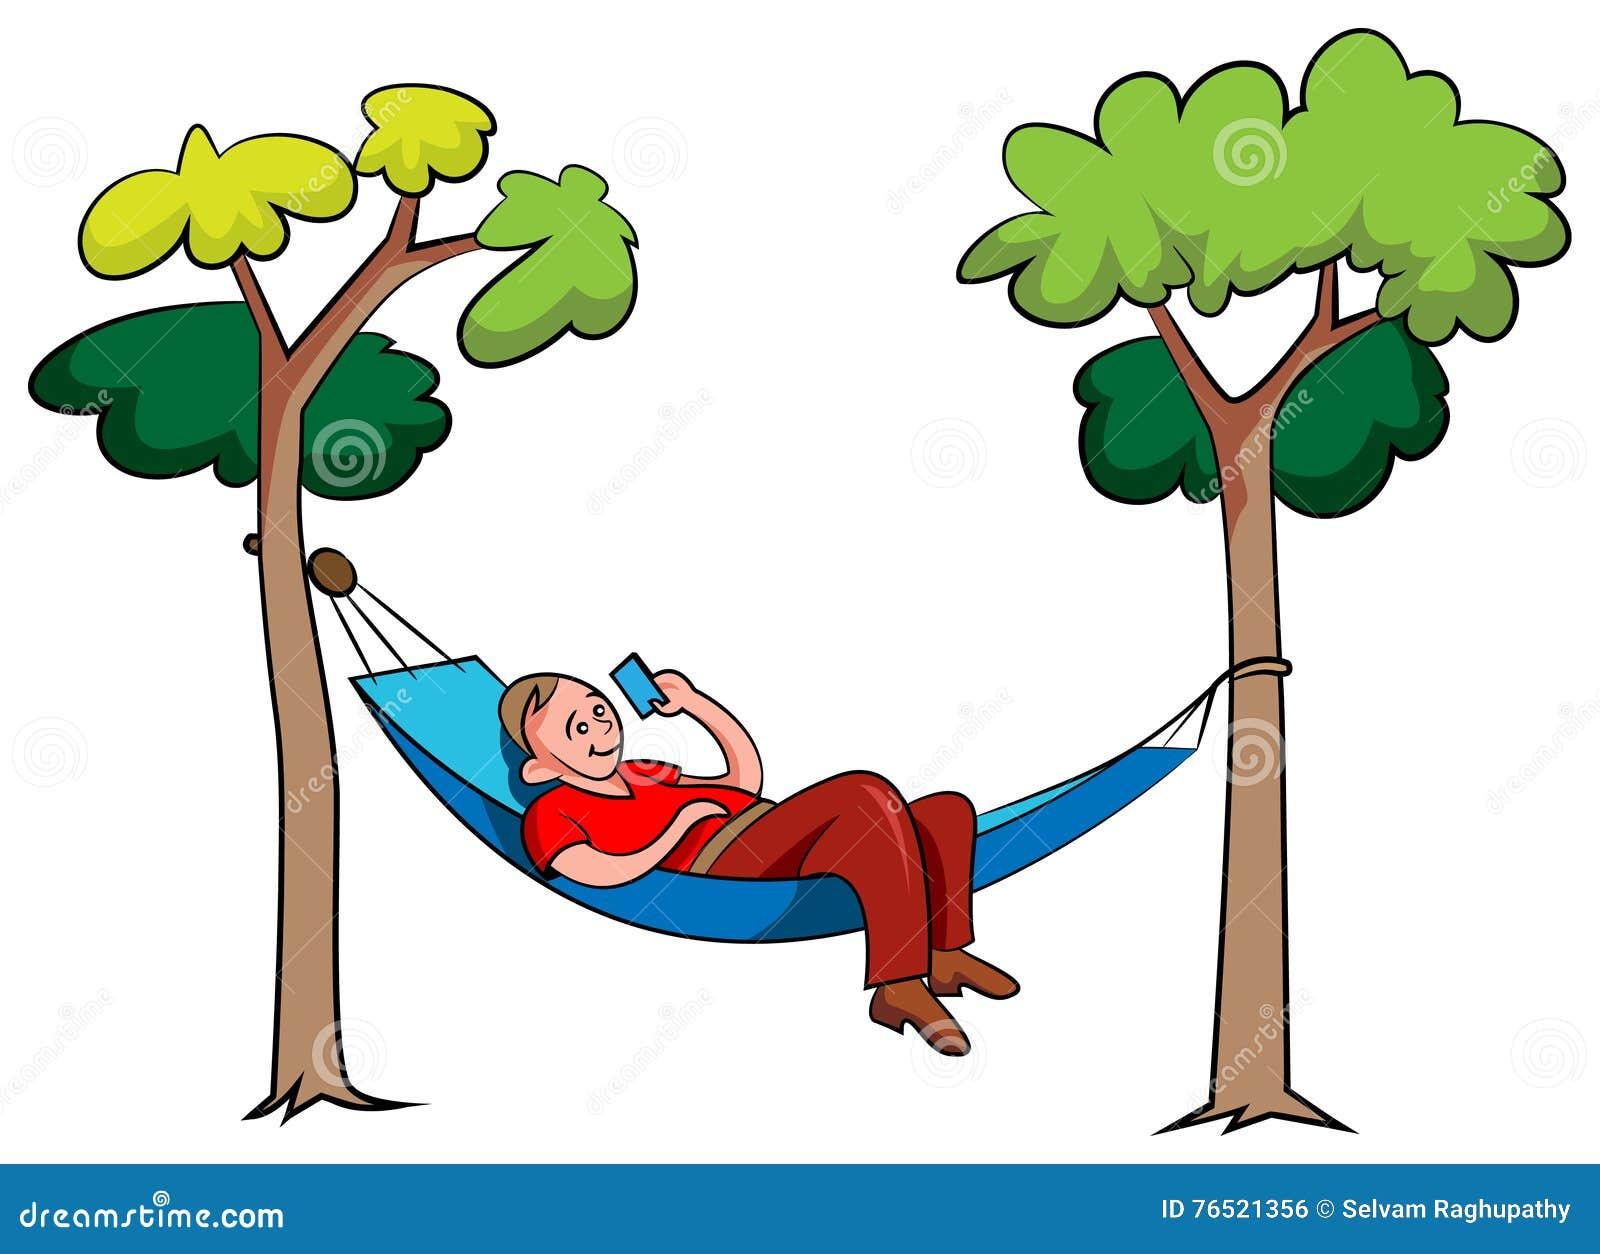 Cartoon Man Relaxing Cartoon Vector | CartoonDealer.com ...